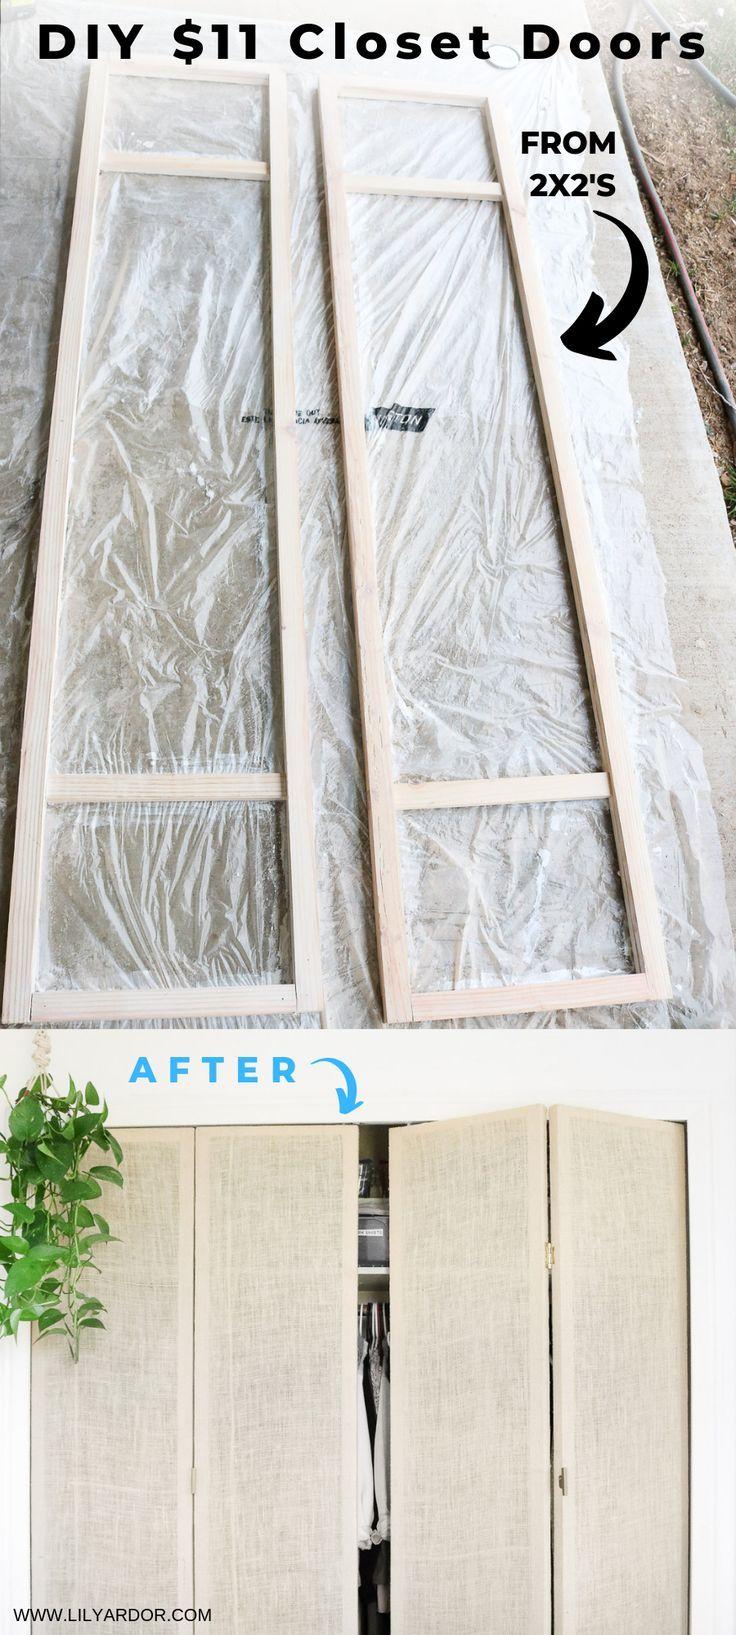 DIY Closet Doors under $50